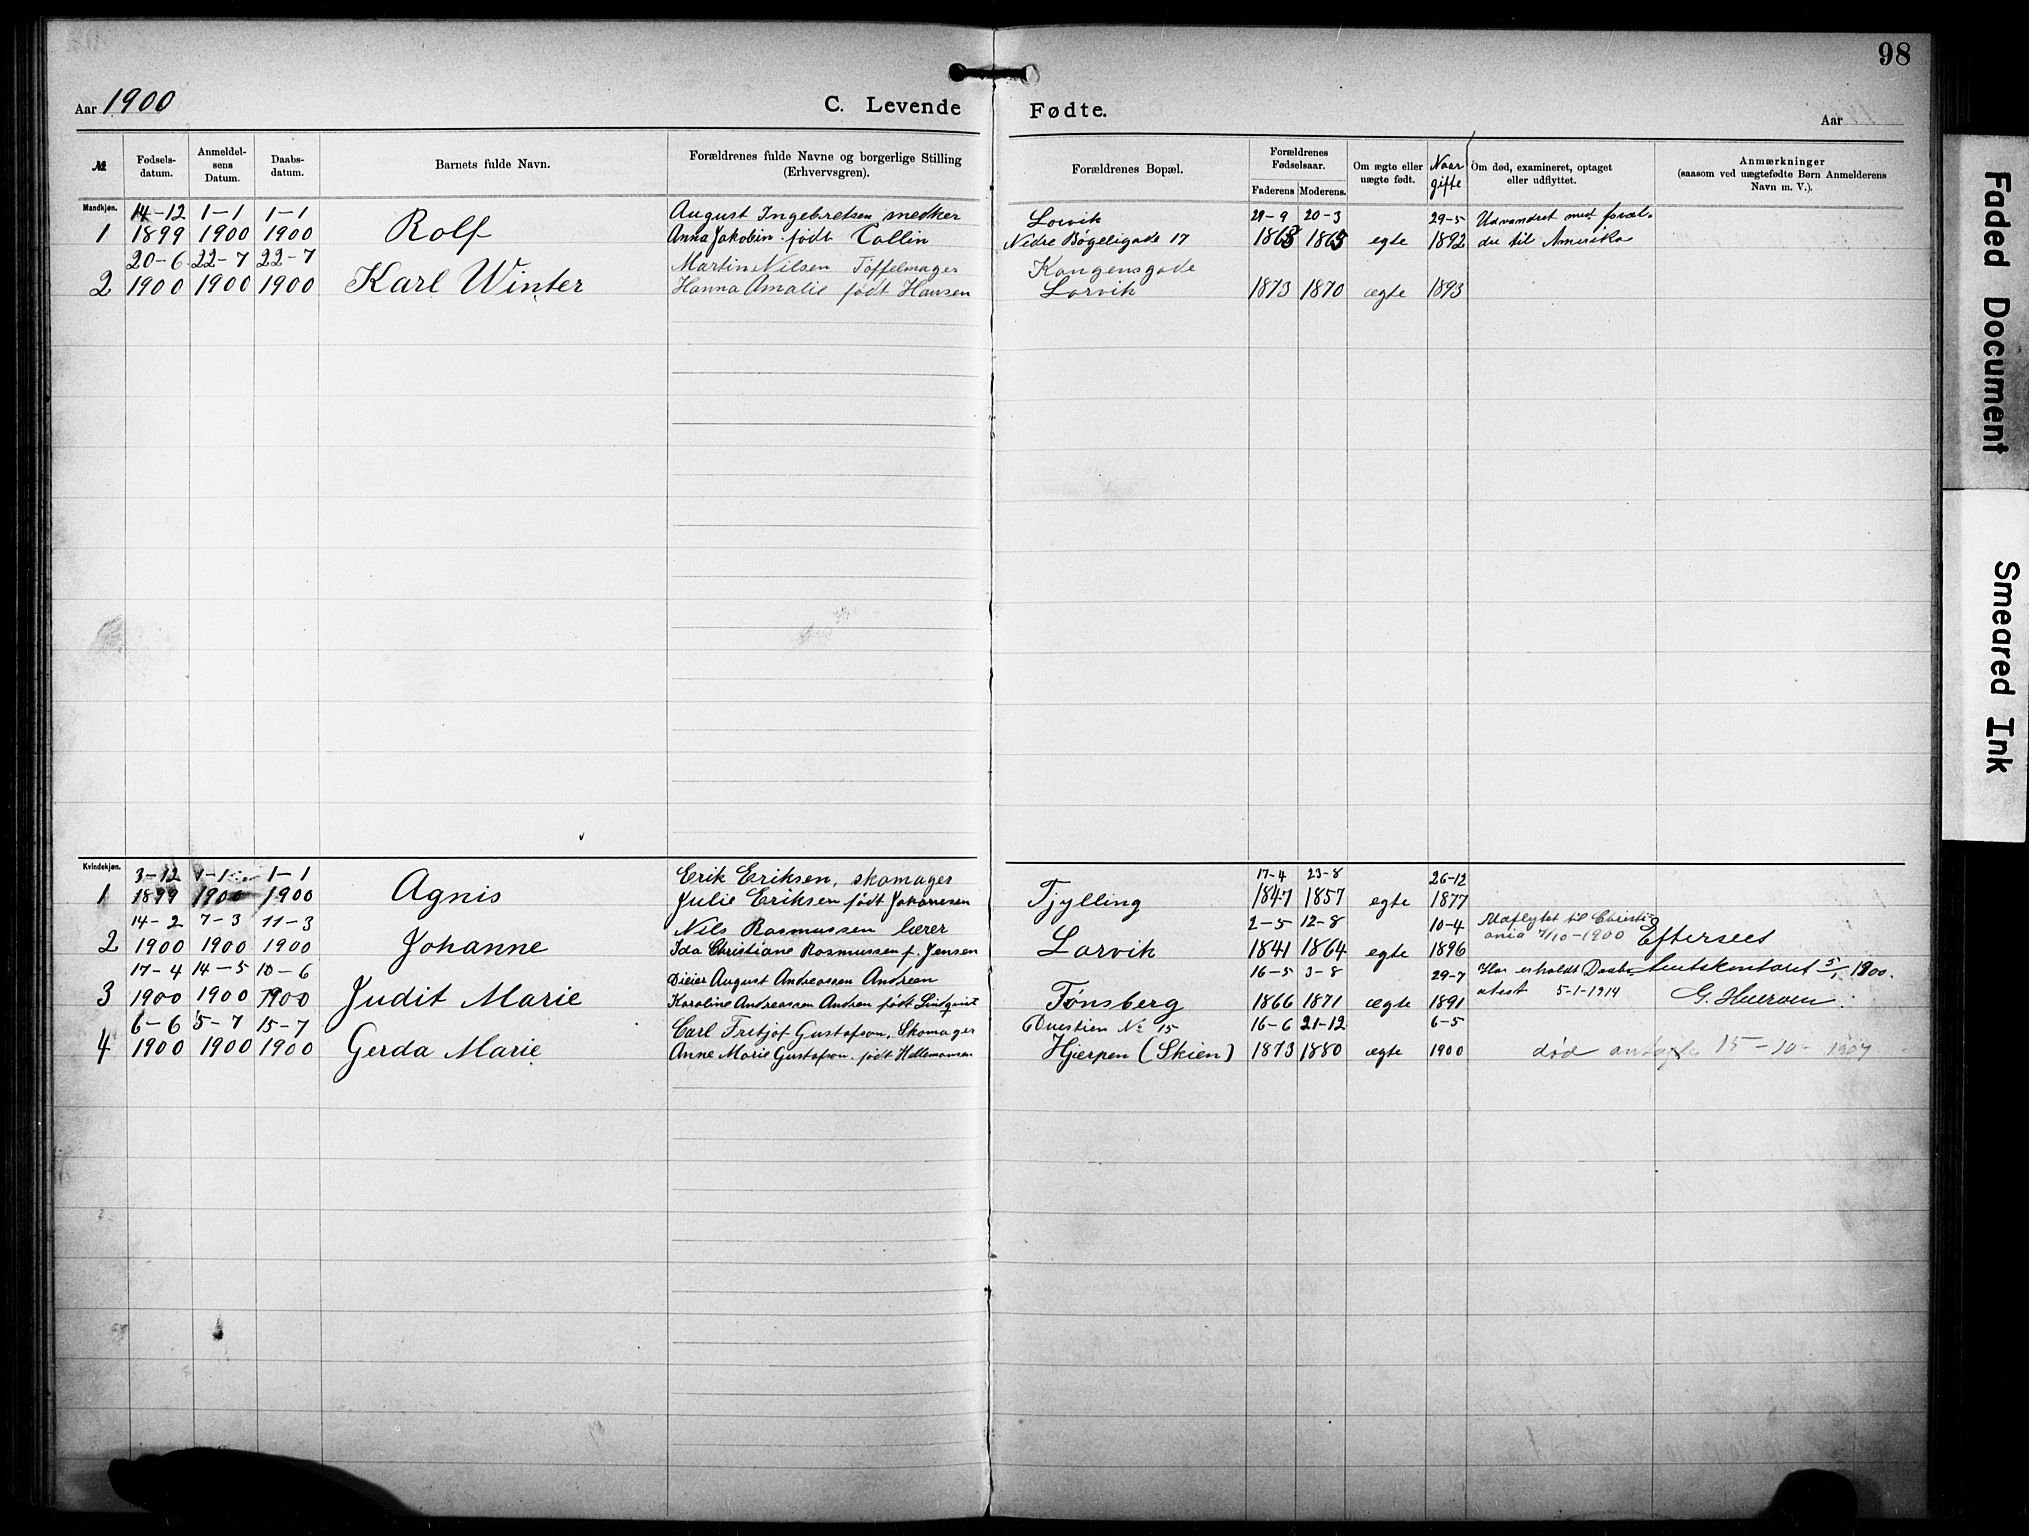 SAKO, Den katolsk-apostoliske menighet i Larvik, F/Fa/L0001: Dissenterprotokoll nr. 1, 1892-1933, s. 98